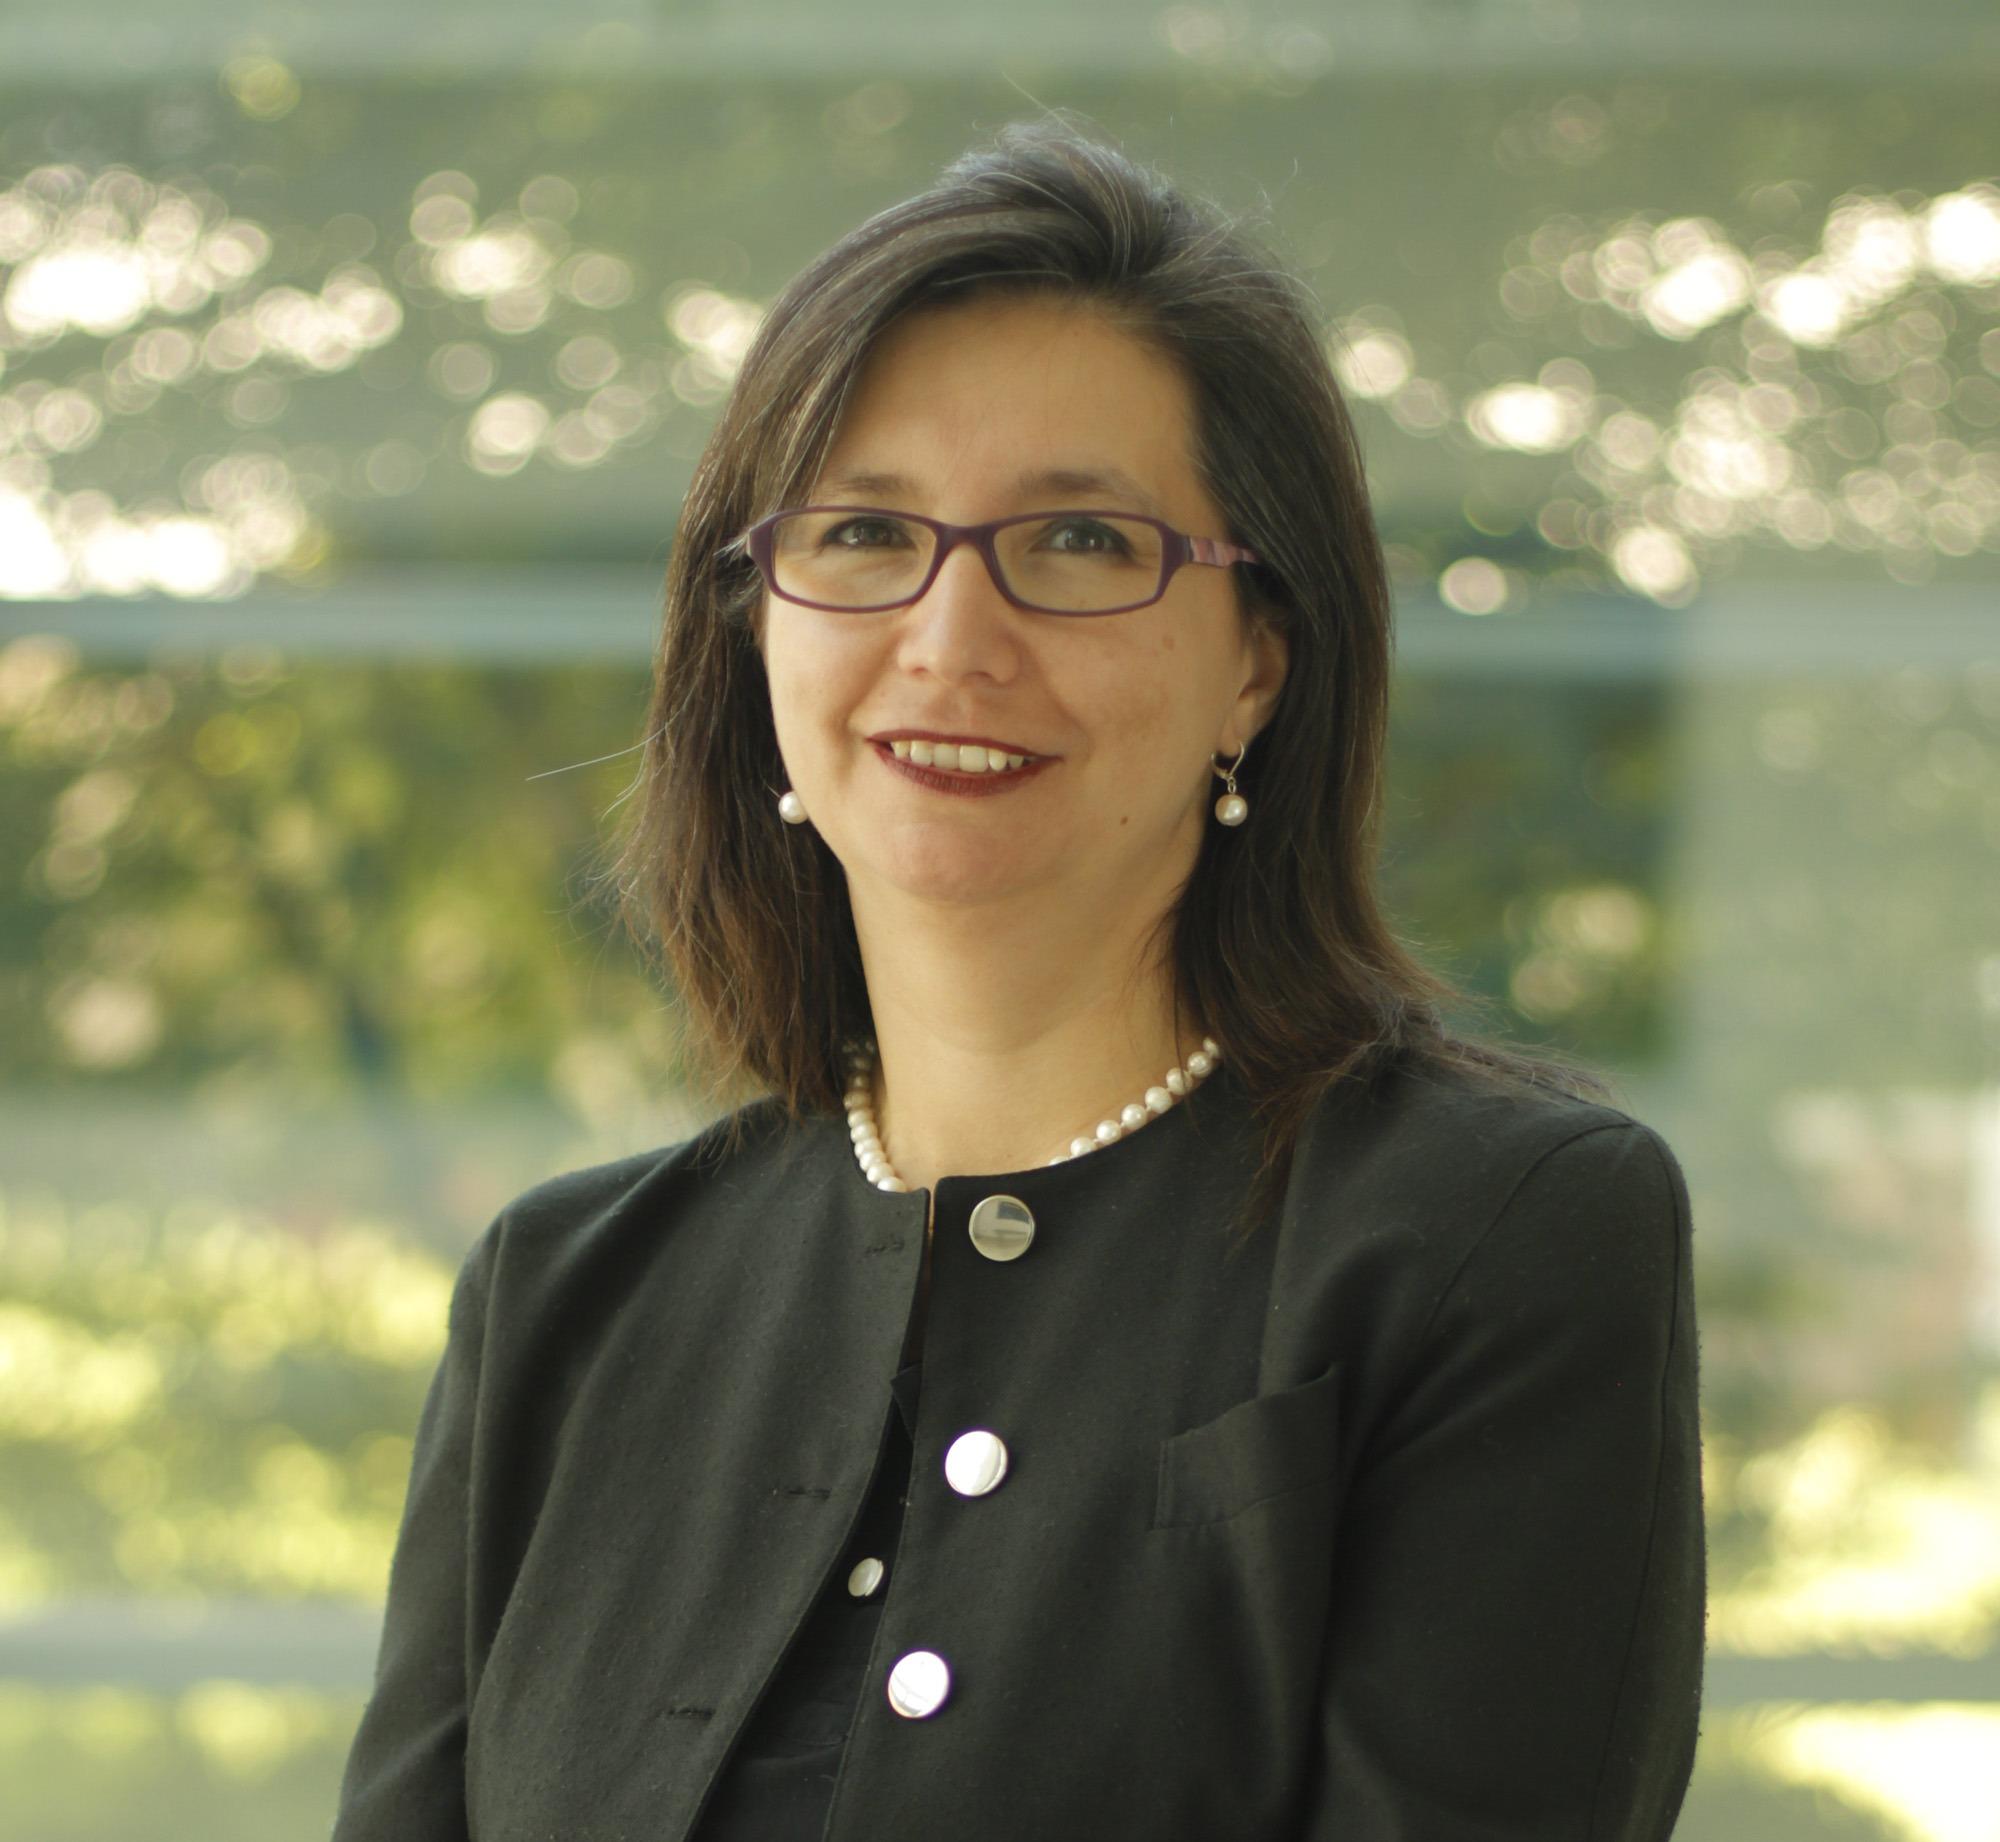 Carolina Gonzalez Reyes